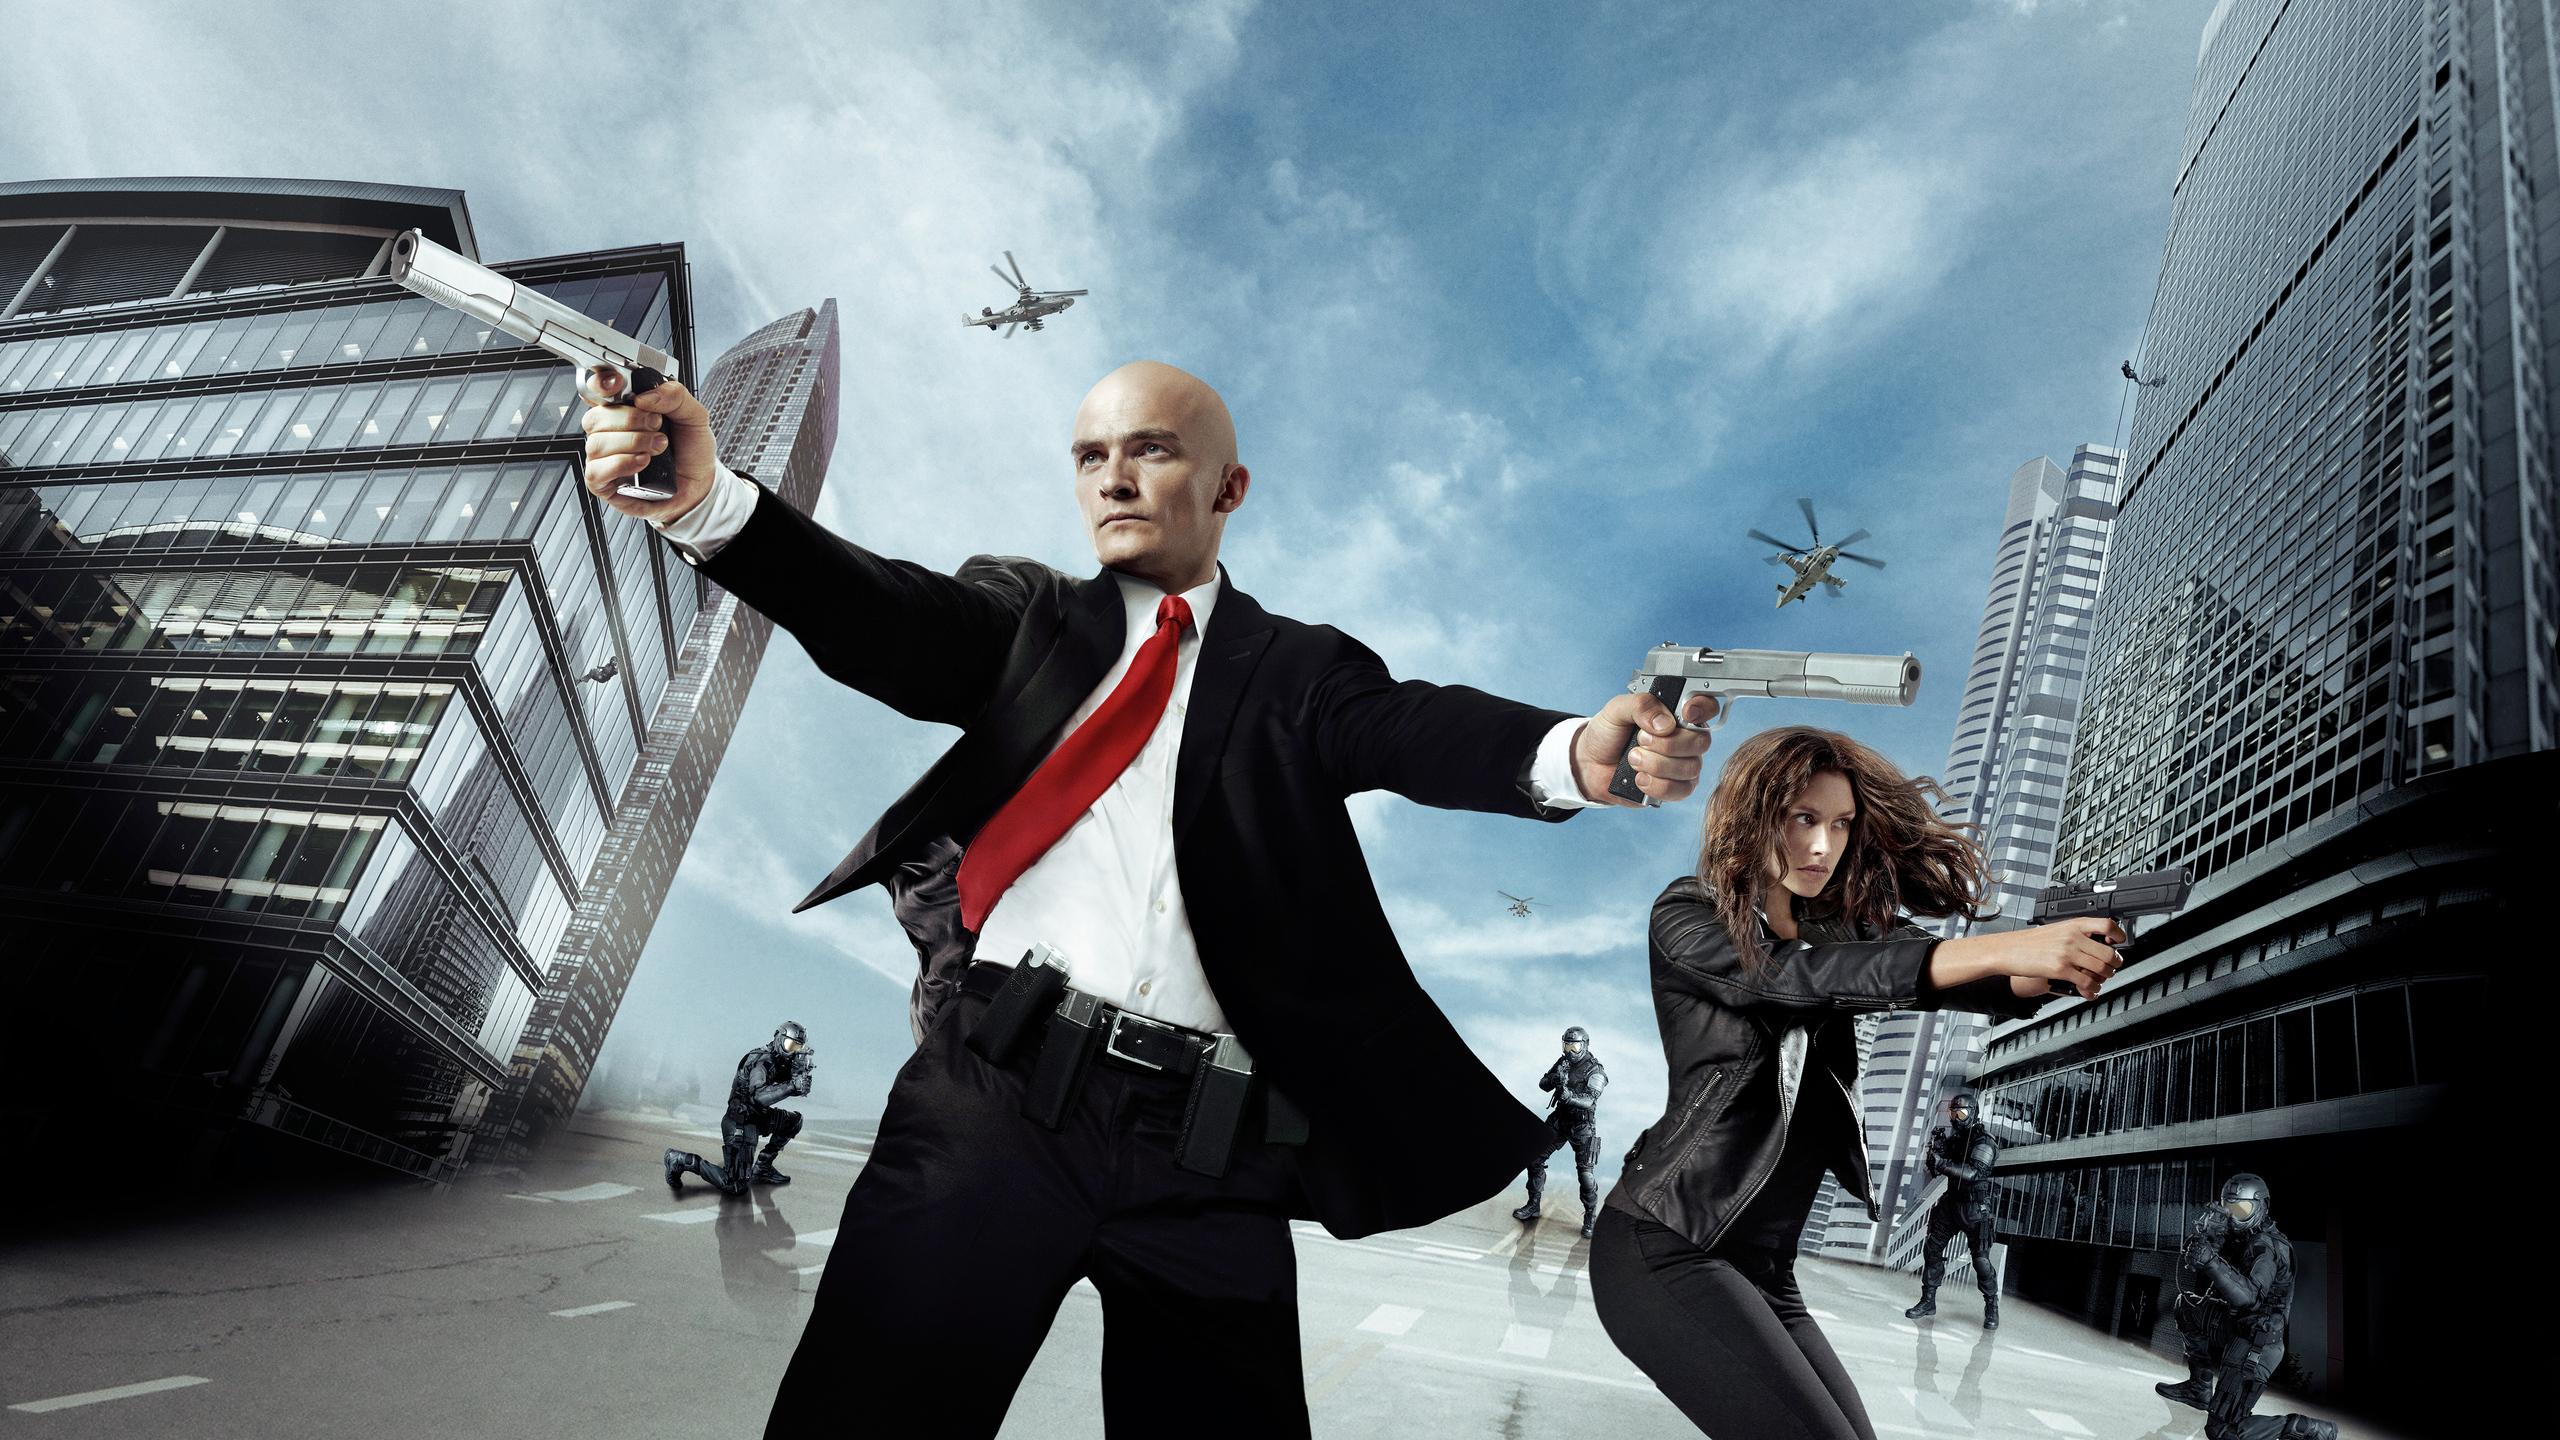 hitman agent 47 full movie download 300mb